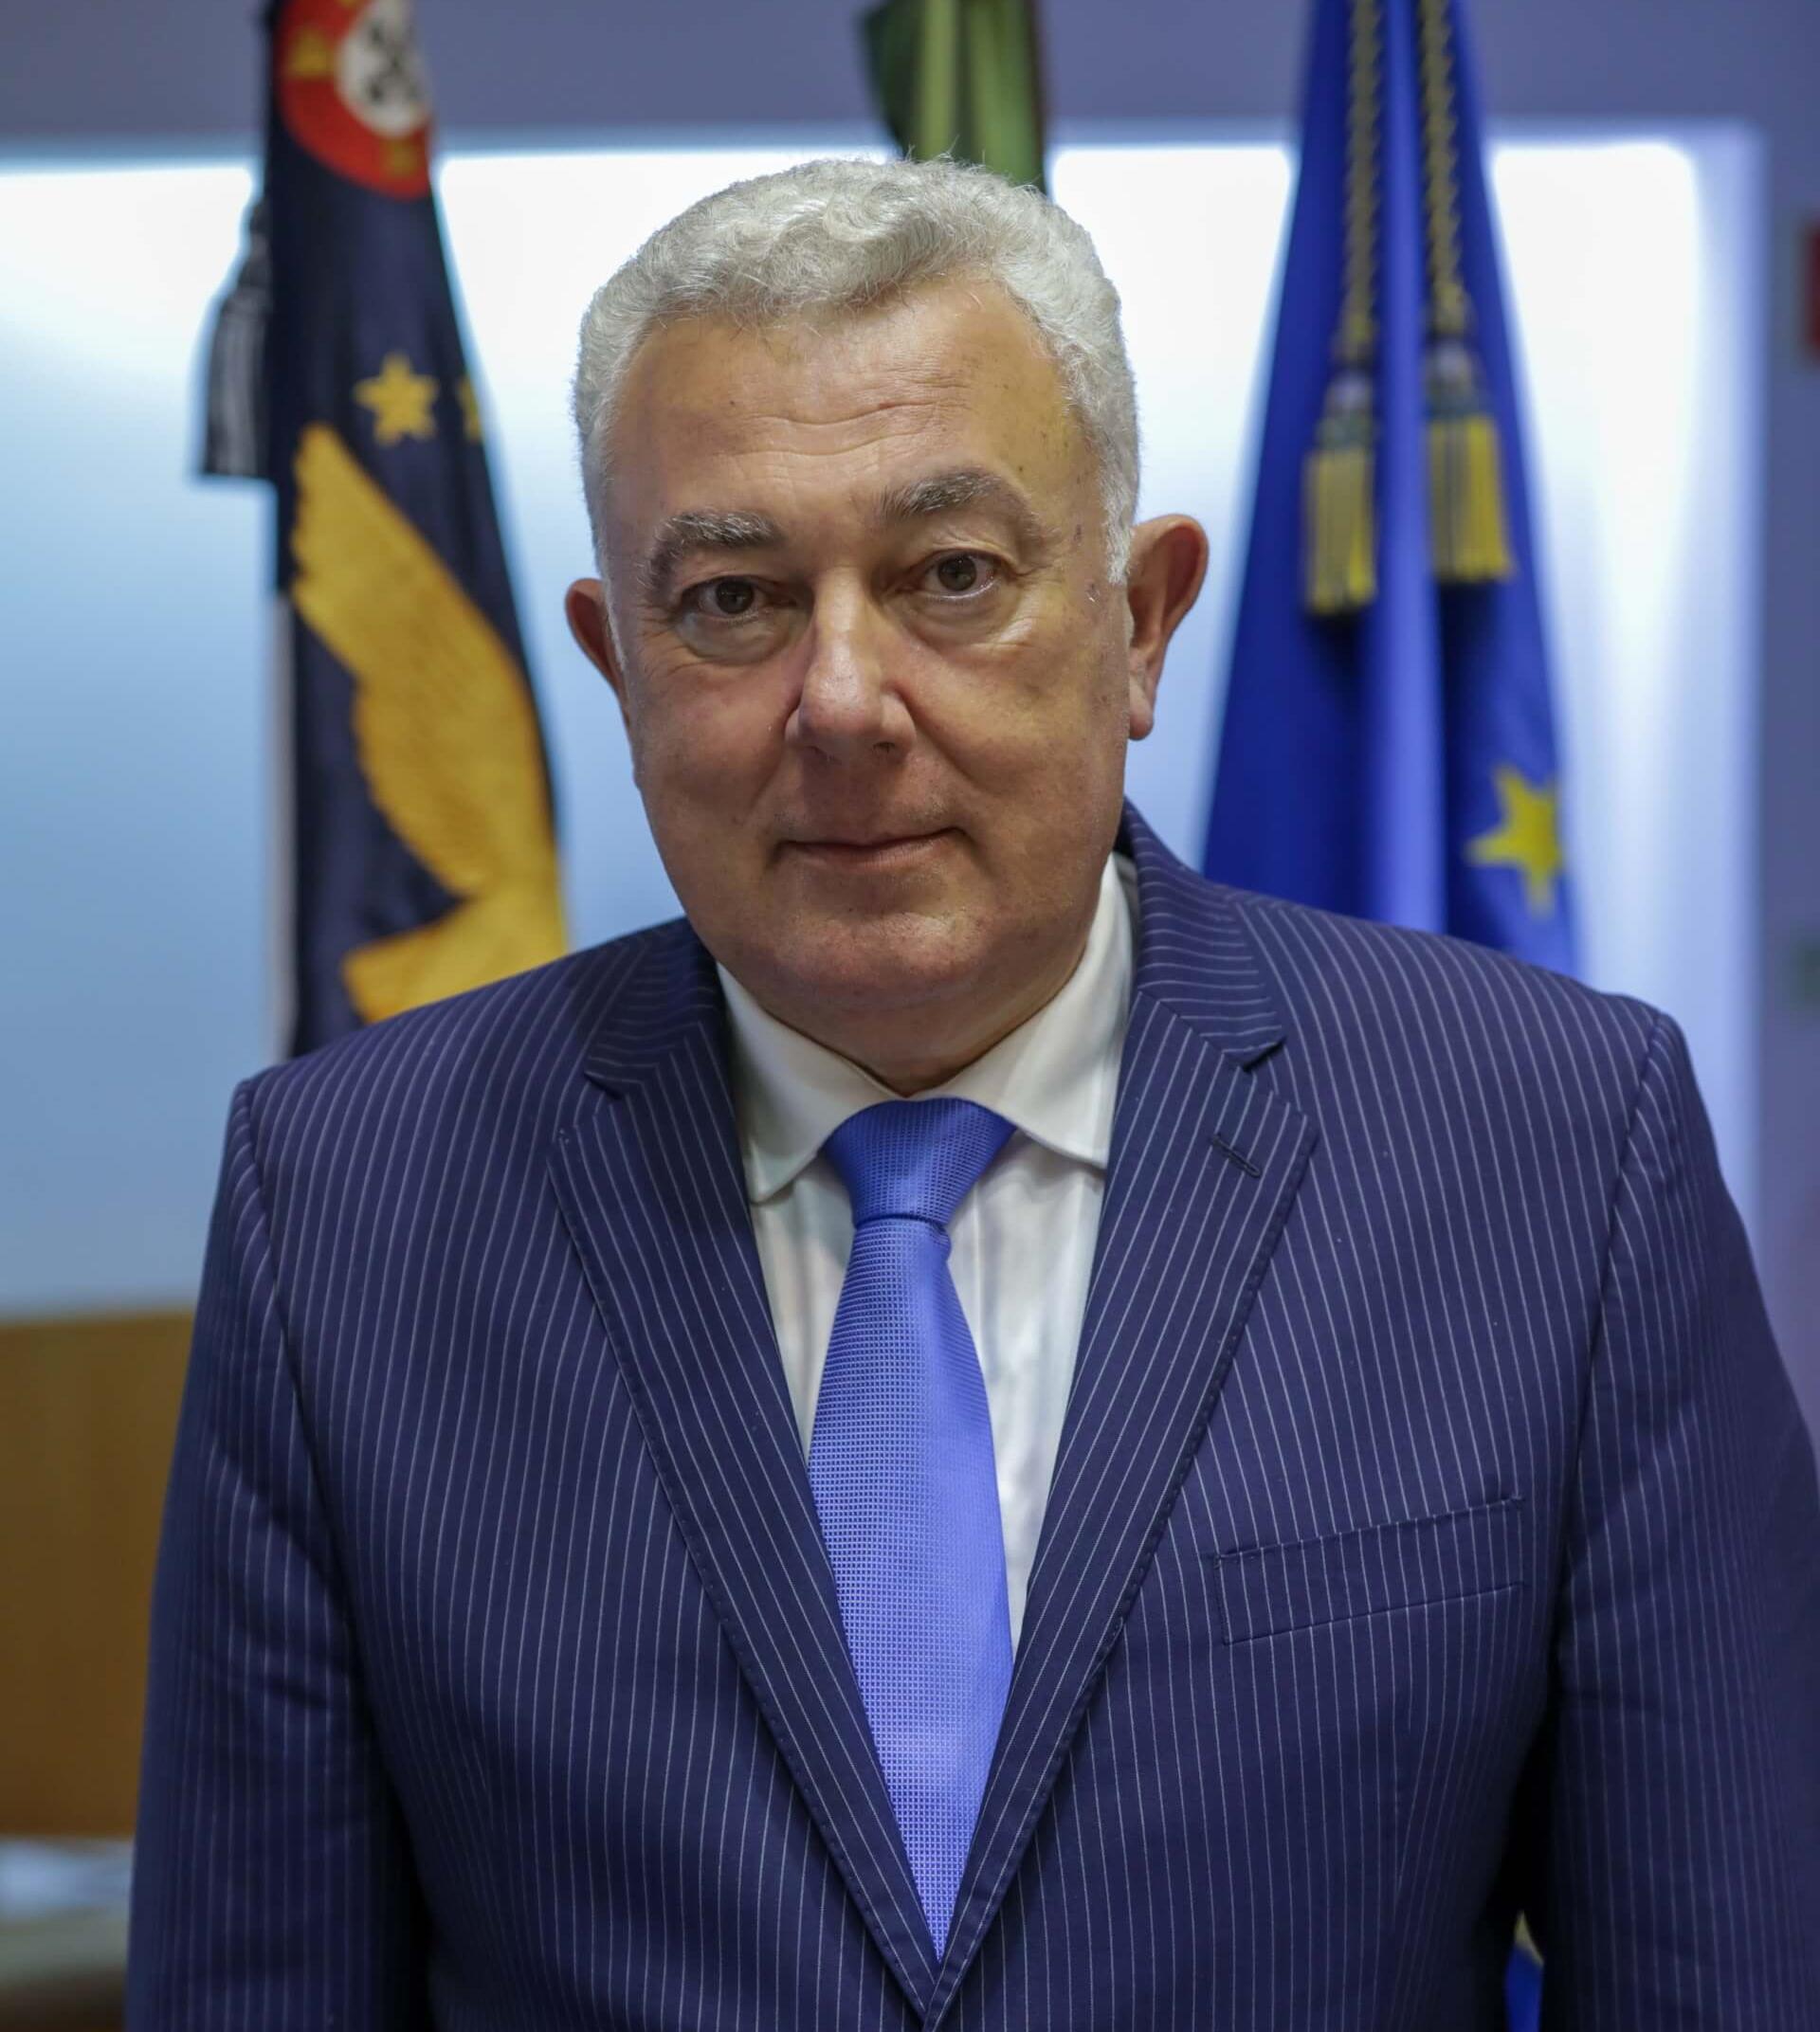 VICE-PRESIDENTE DO GOVERNO TESTA POSITIVAMENTE À COVID-19